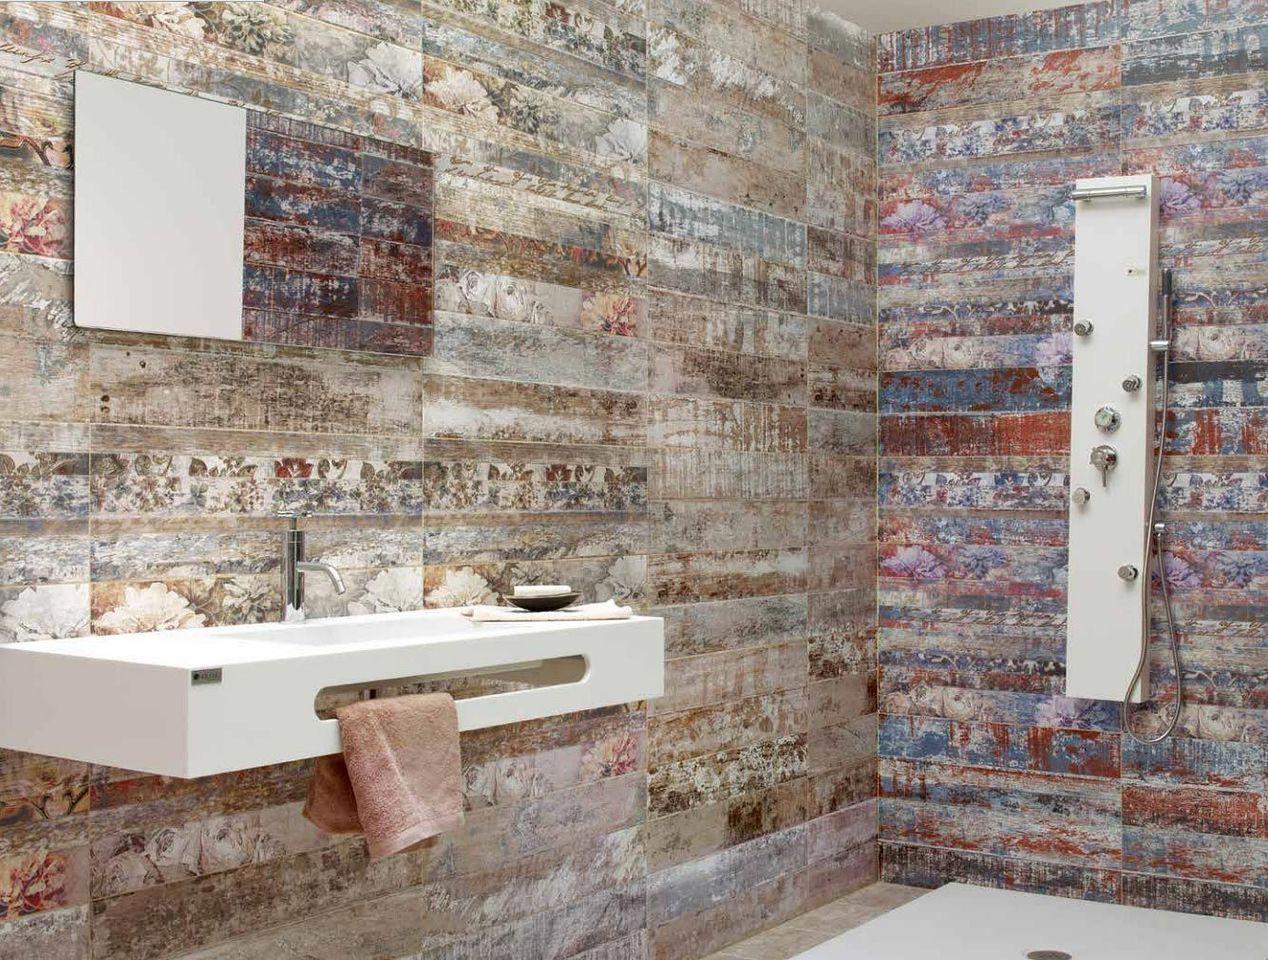 Latina ceramica kuny perth pinterest perth wall tiles latina ceramica kuny perth dailygadgetfo Image collections